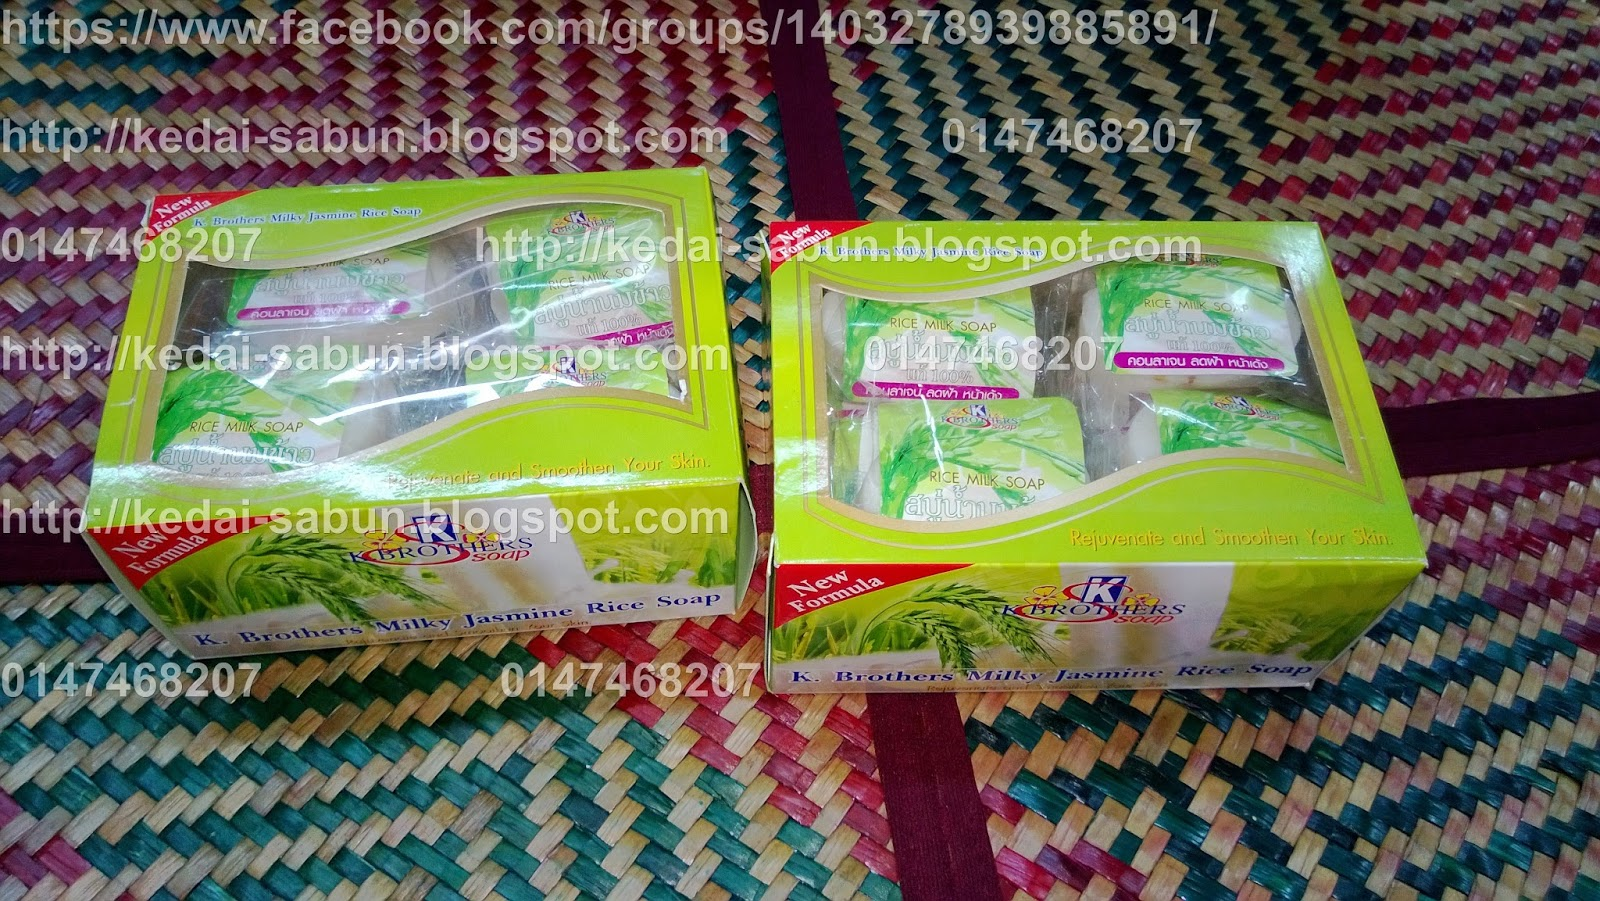 Sabun Susu Beras Collagen Kedai Produk Kecantikan Dan Kesihatan Pack K Brothers